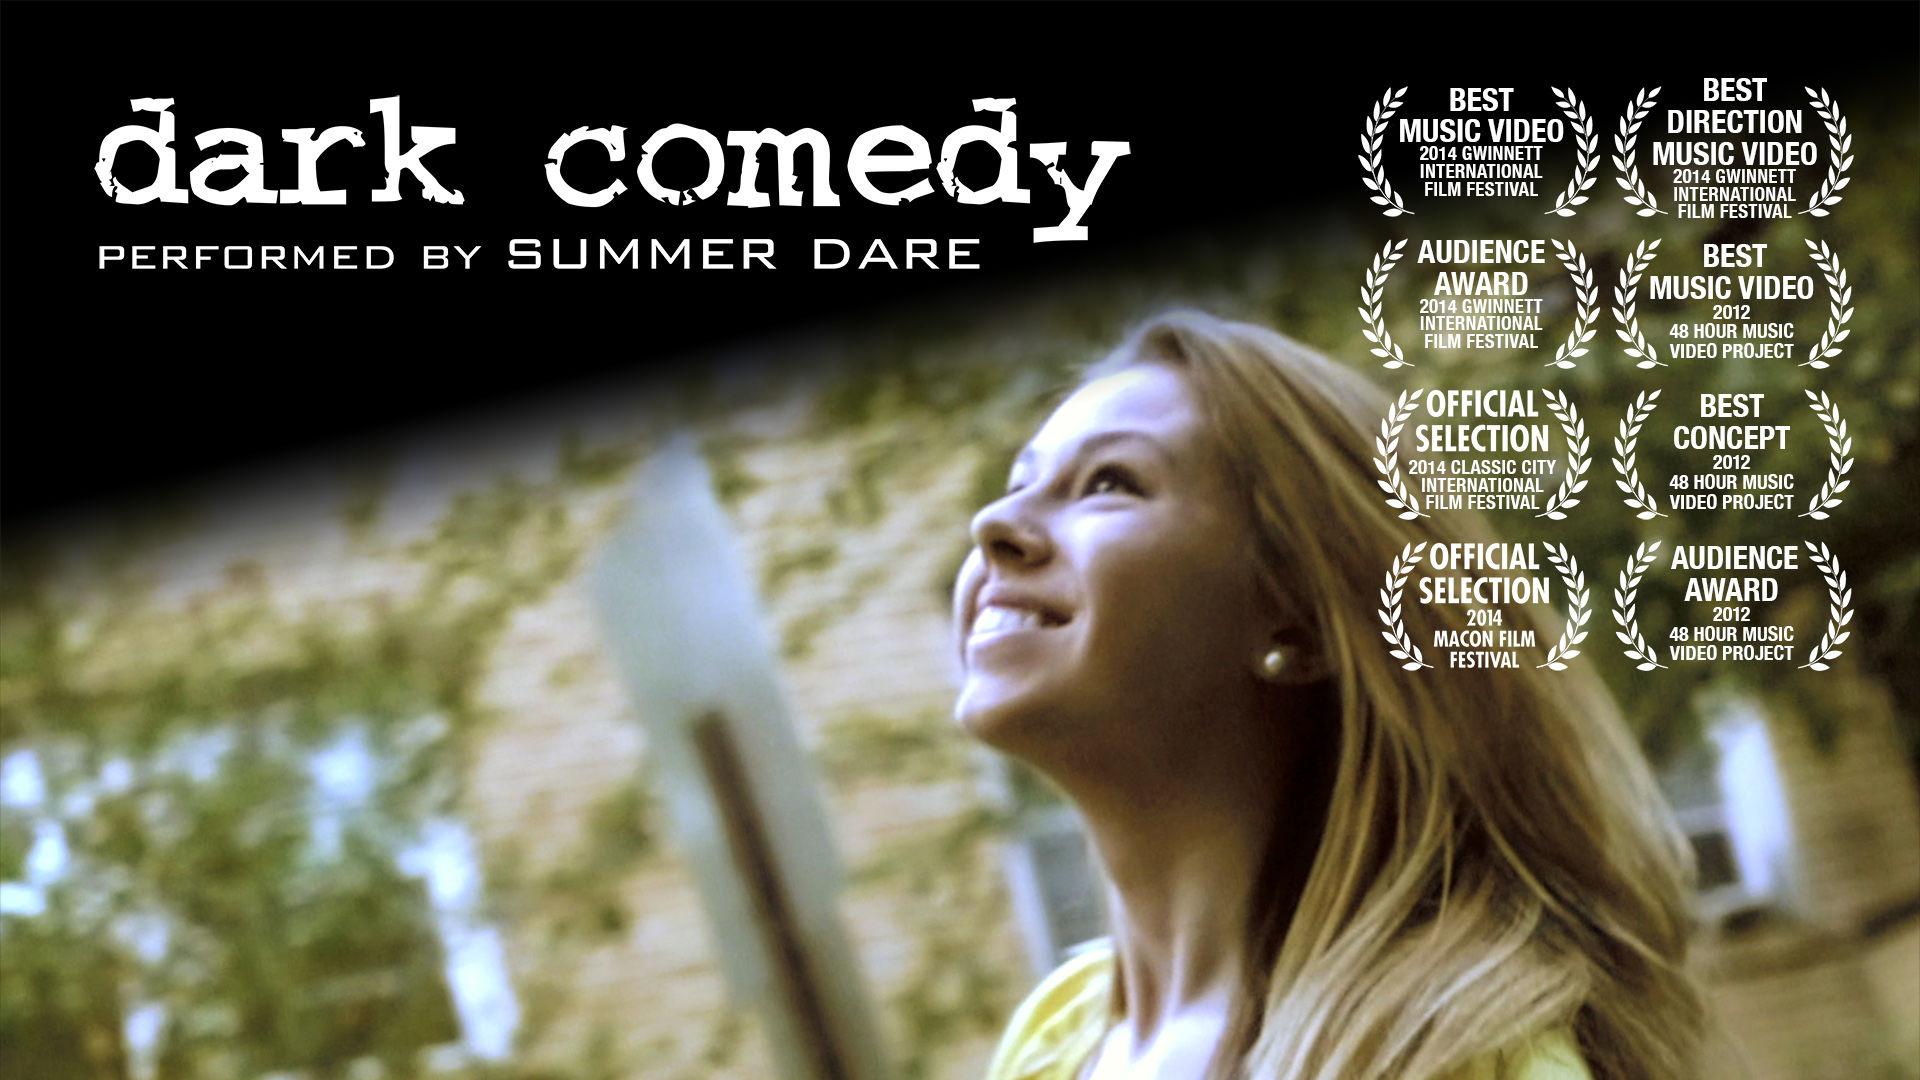 Dark Comedy (2012)